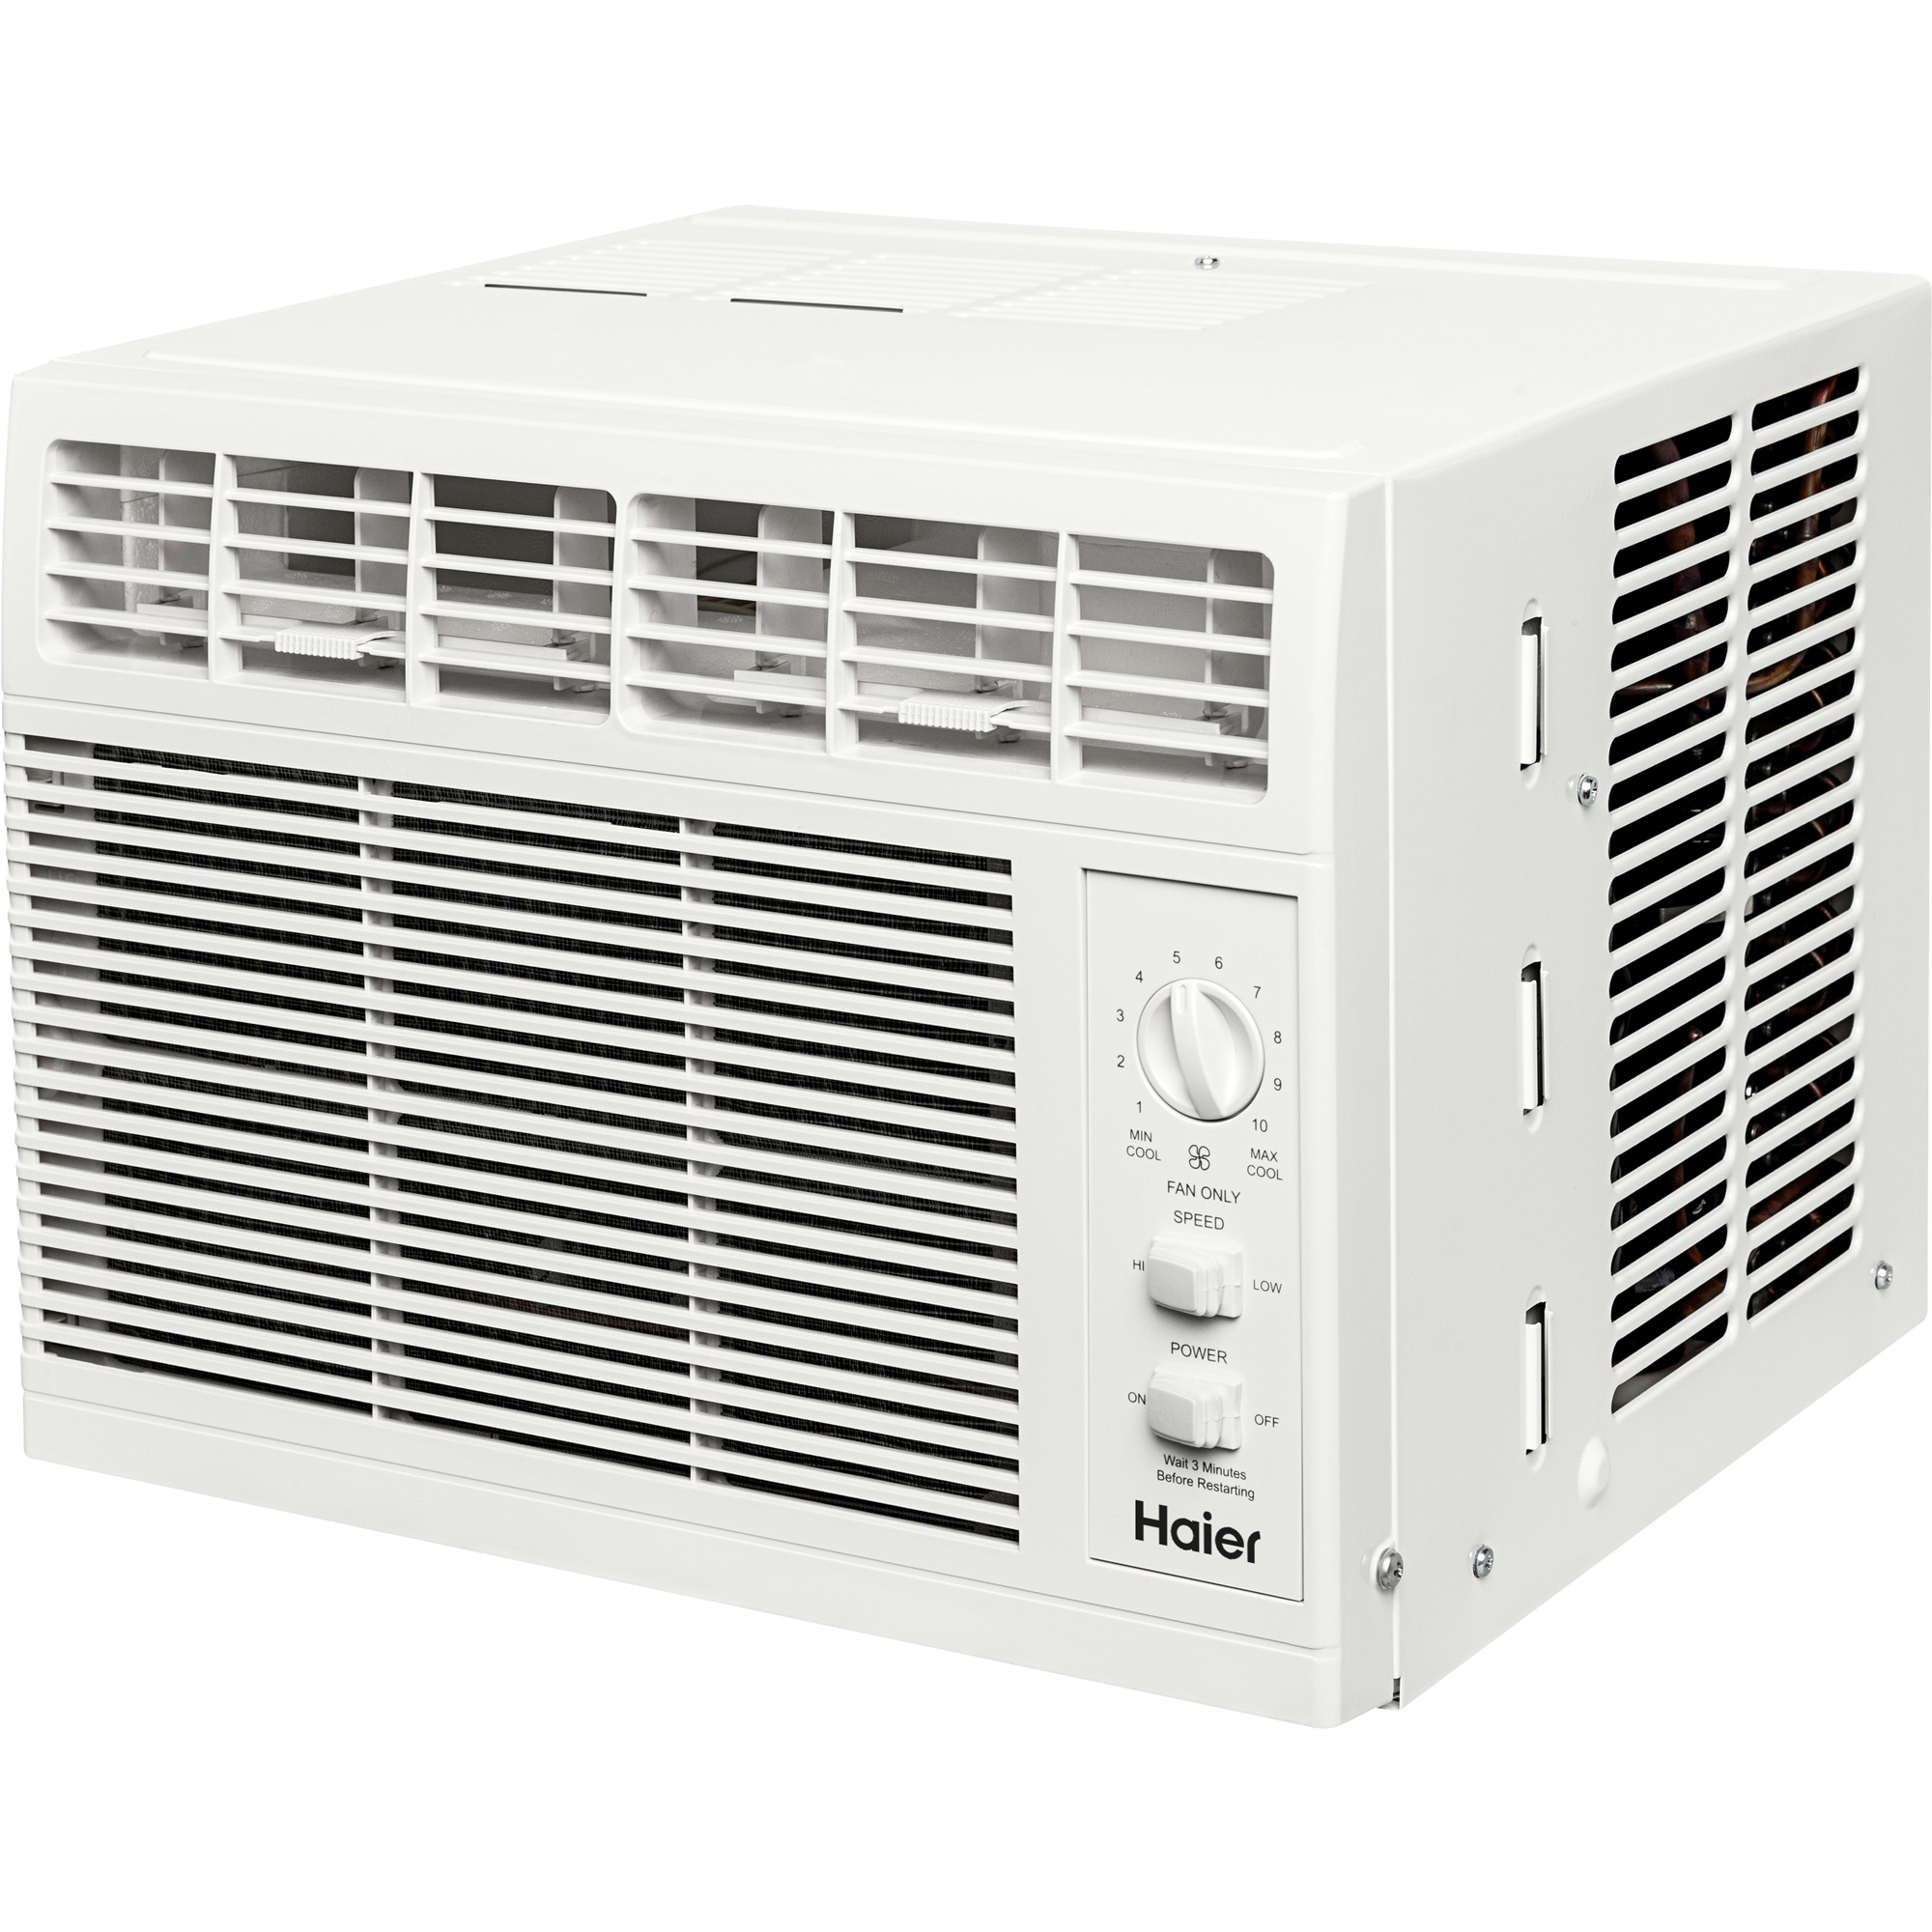 Haier 5,000 BTU Mechanical Air Conditioner, QHV05LX